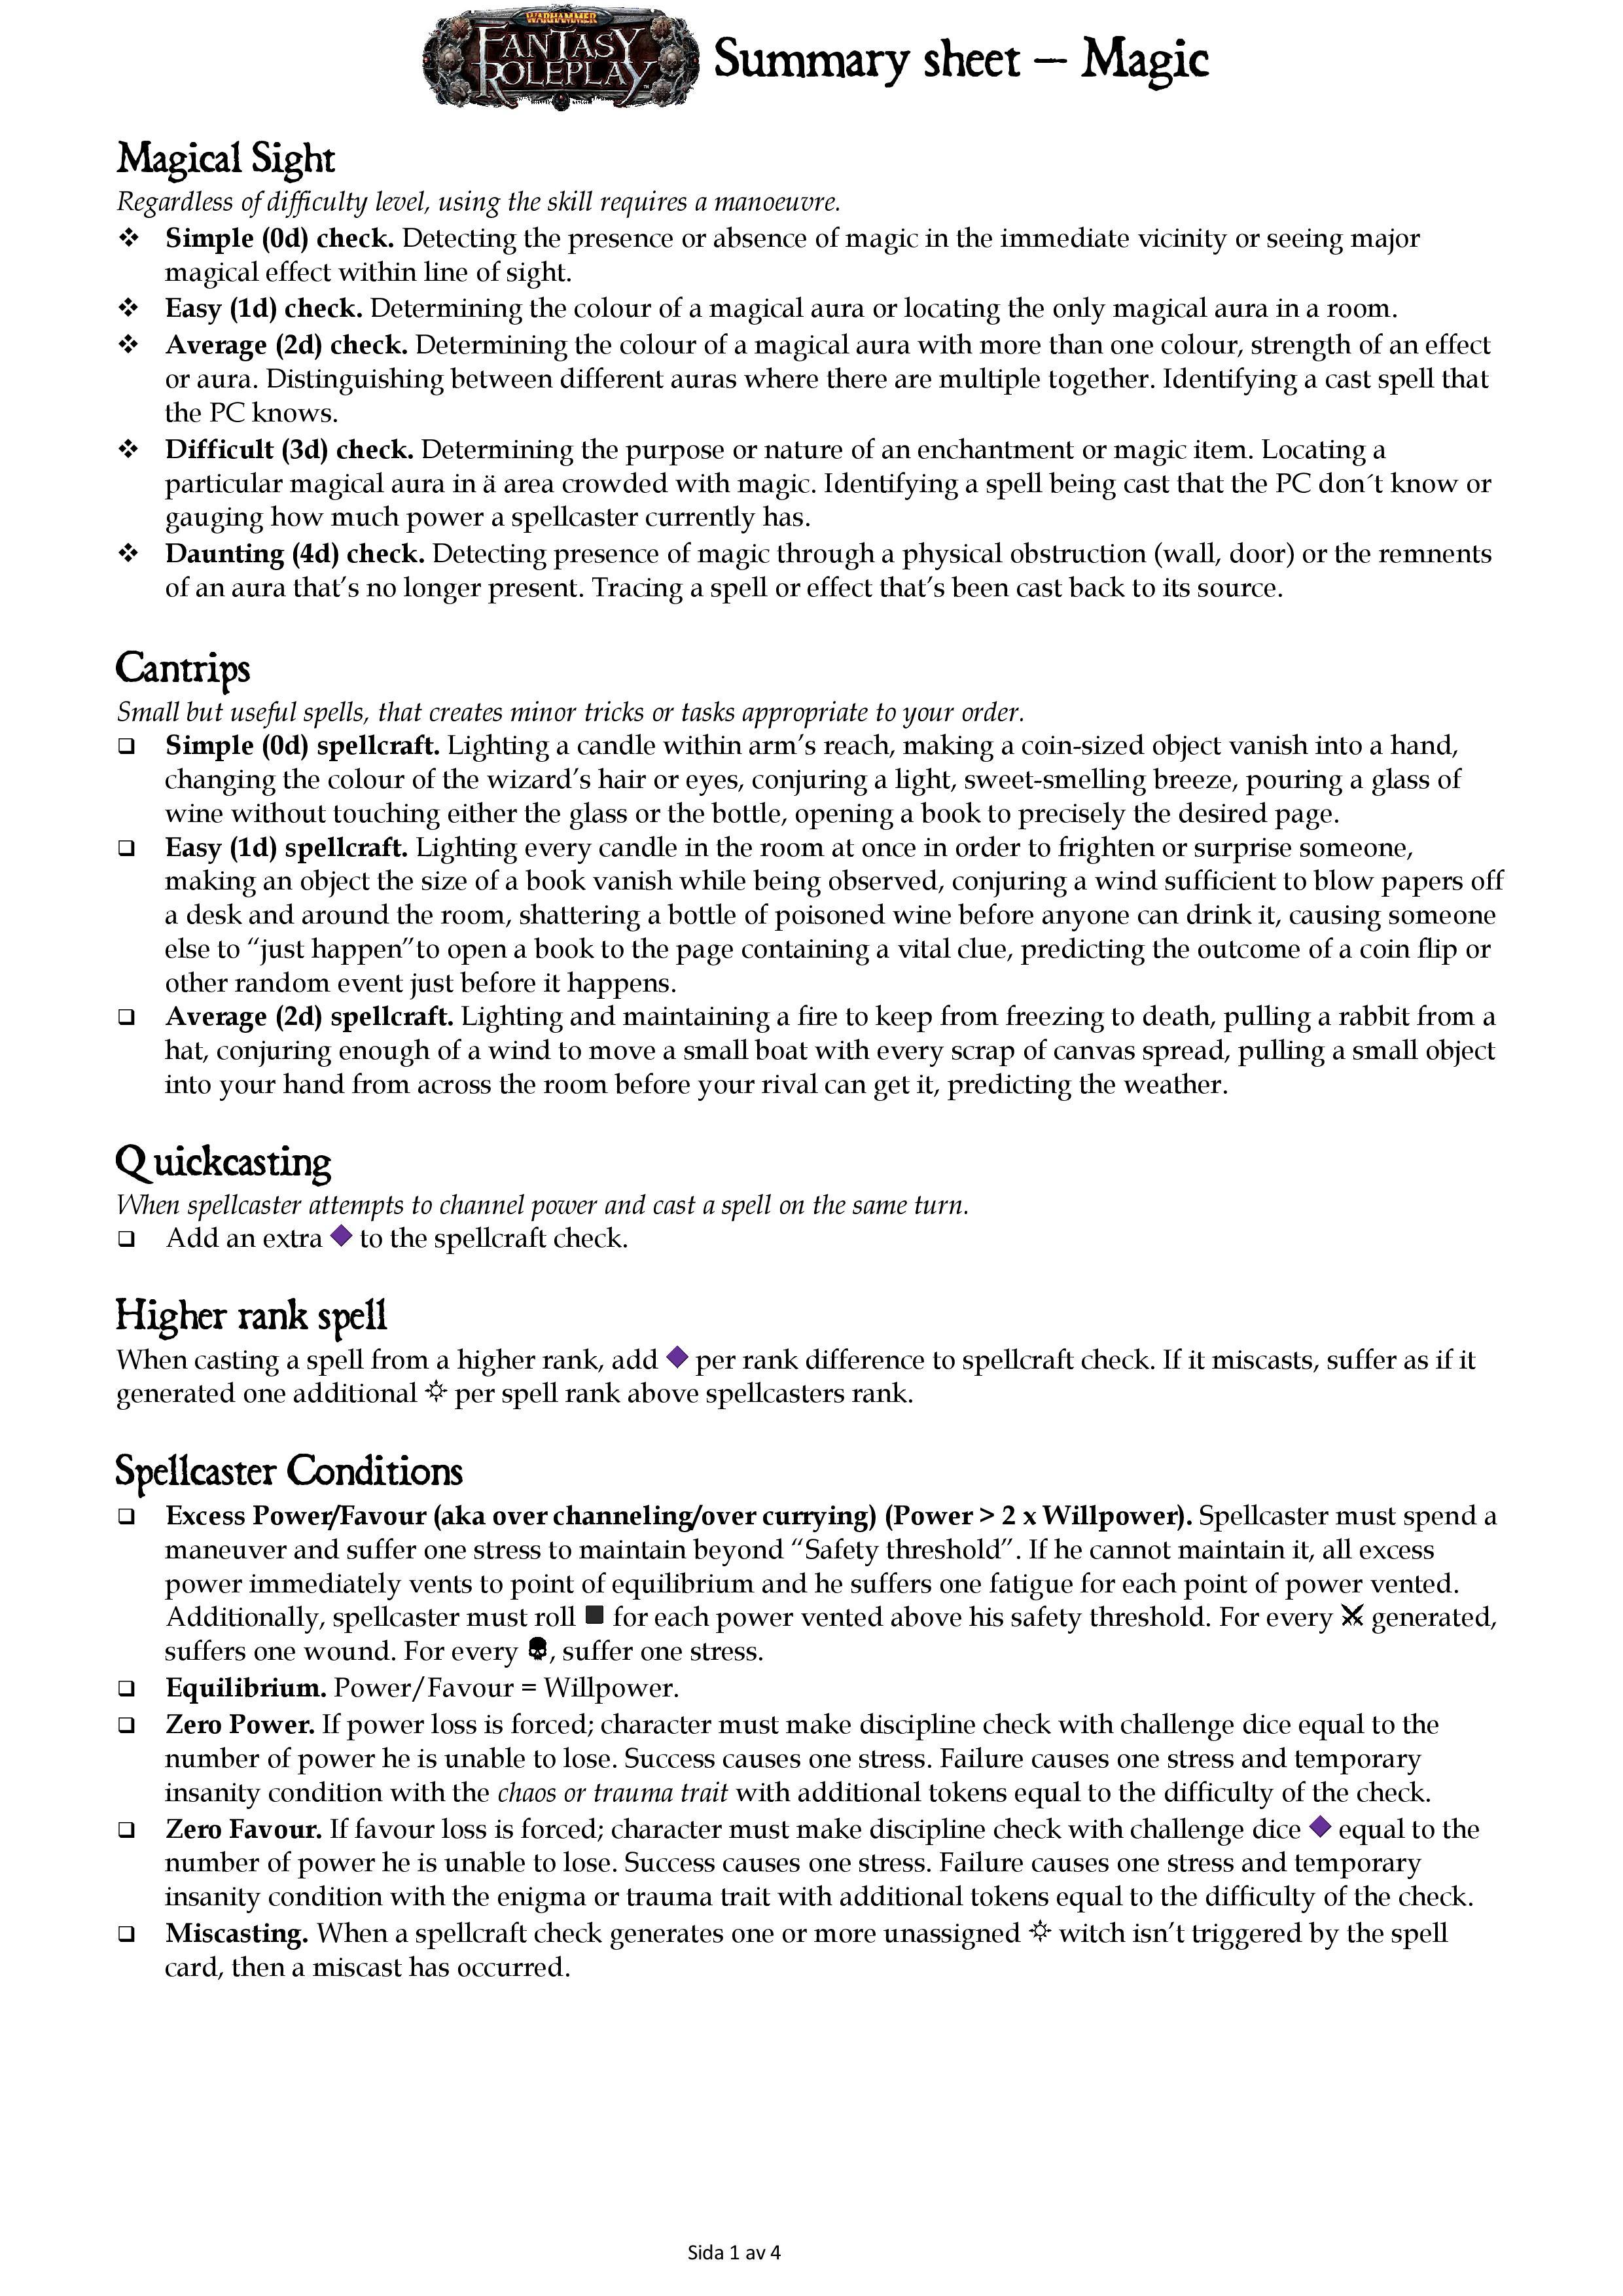 WFRP_3ed_Summary_Sheet_-_Magic-page-001.jpg